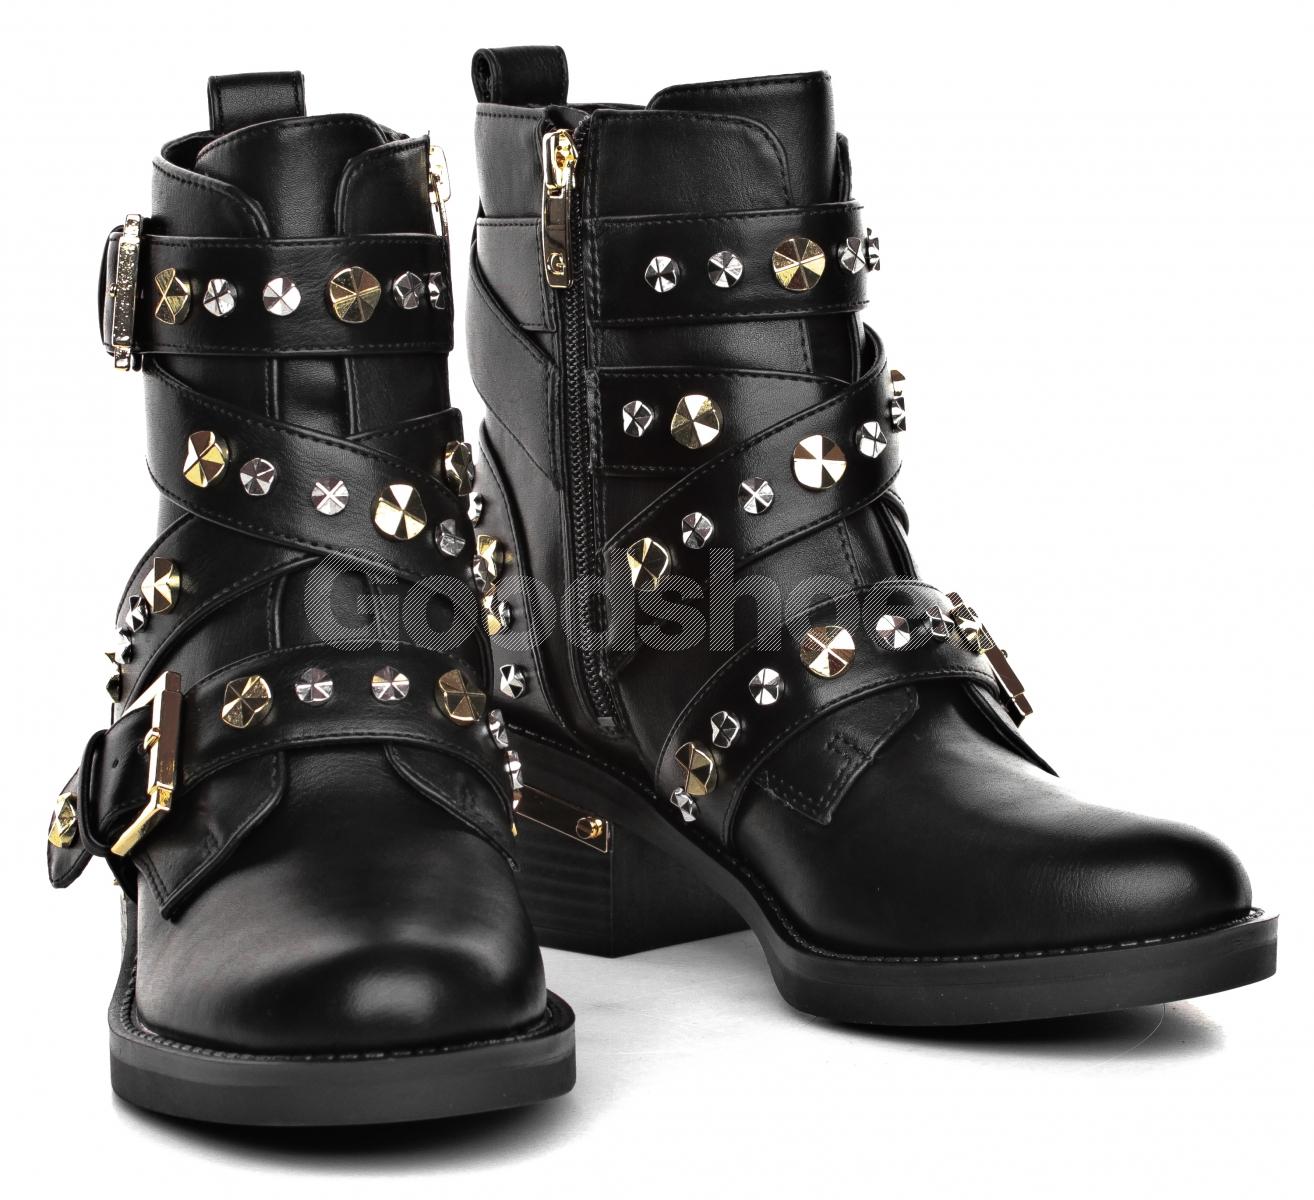 2d88af299fabf Botki Damskie GUESS Czarne FANCEY FLFNC4 ELE10 BLACK - Goodshoes.pl